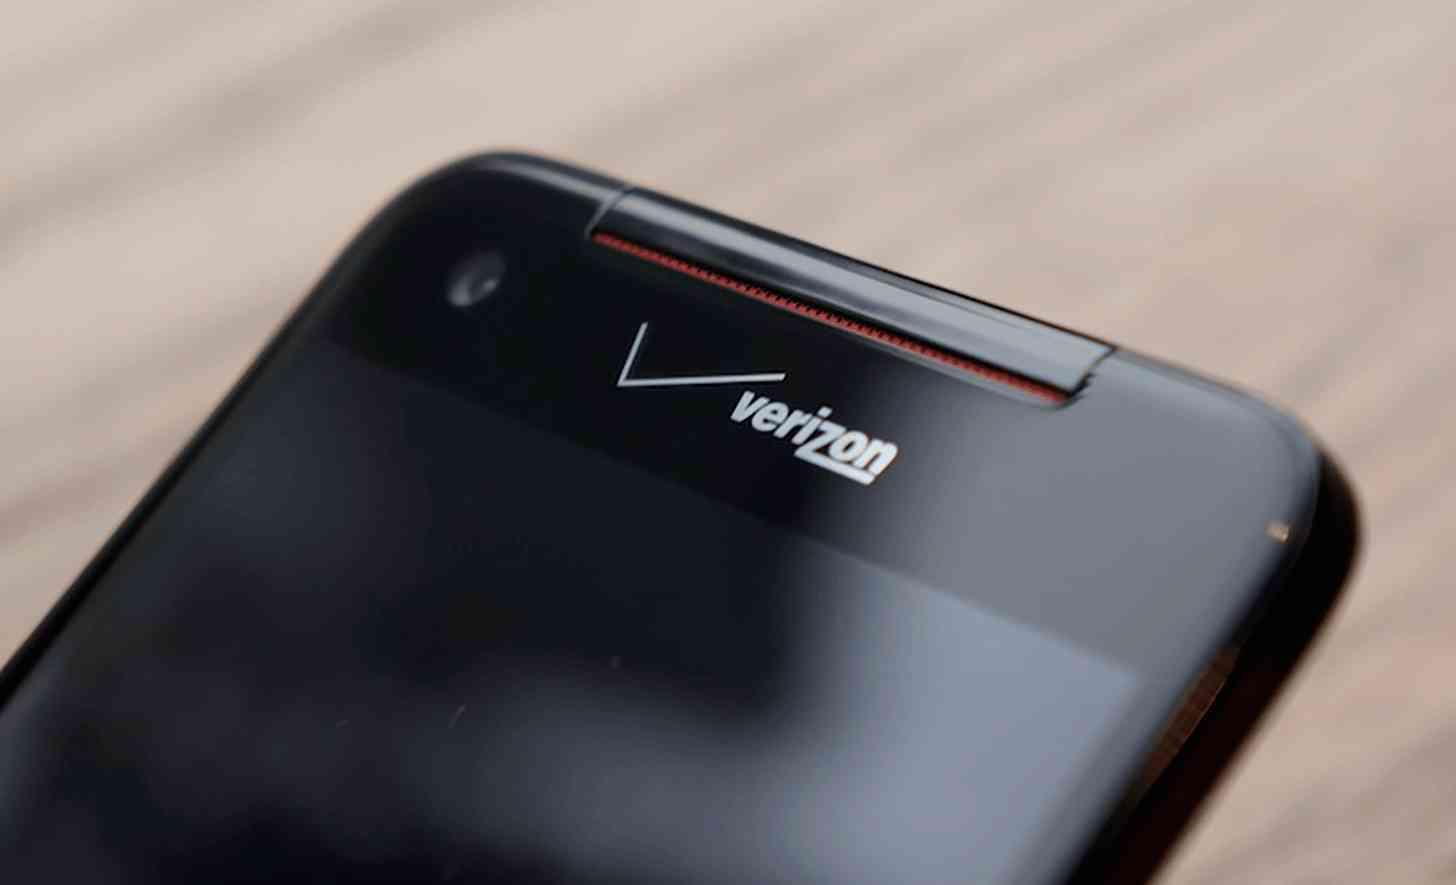 Verizon logo DROID DNA